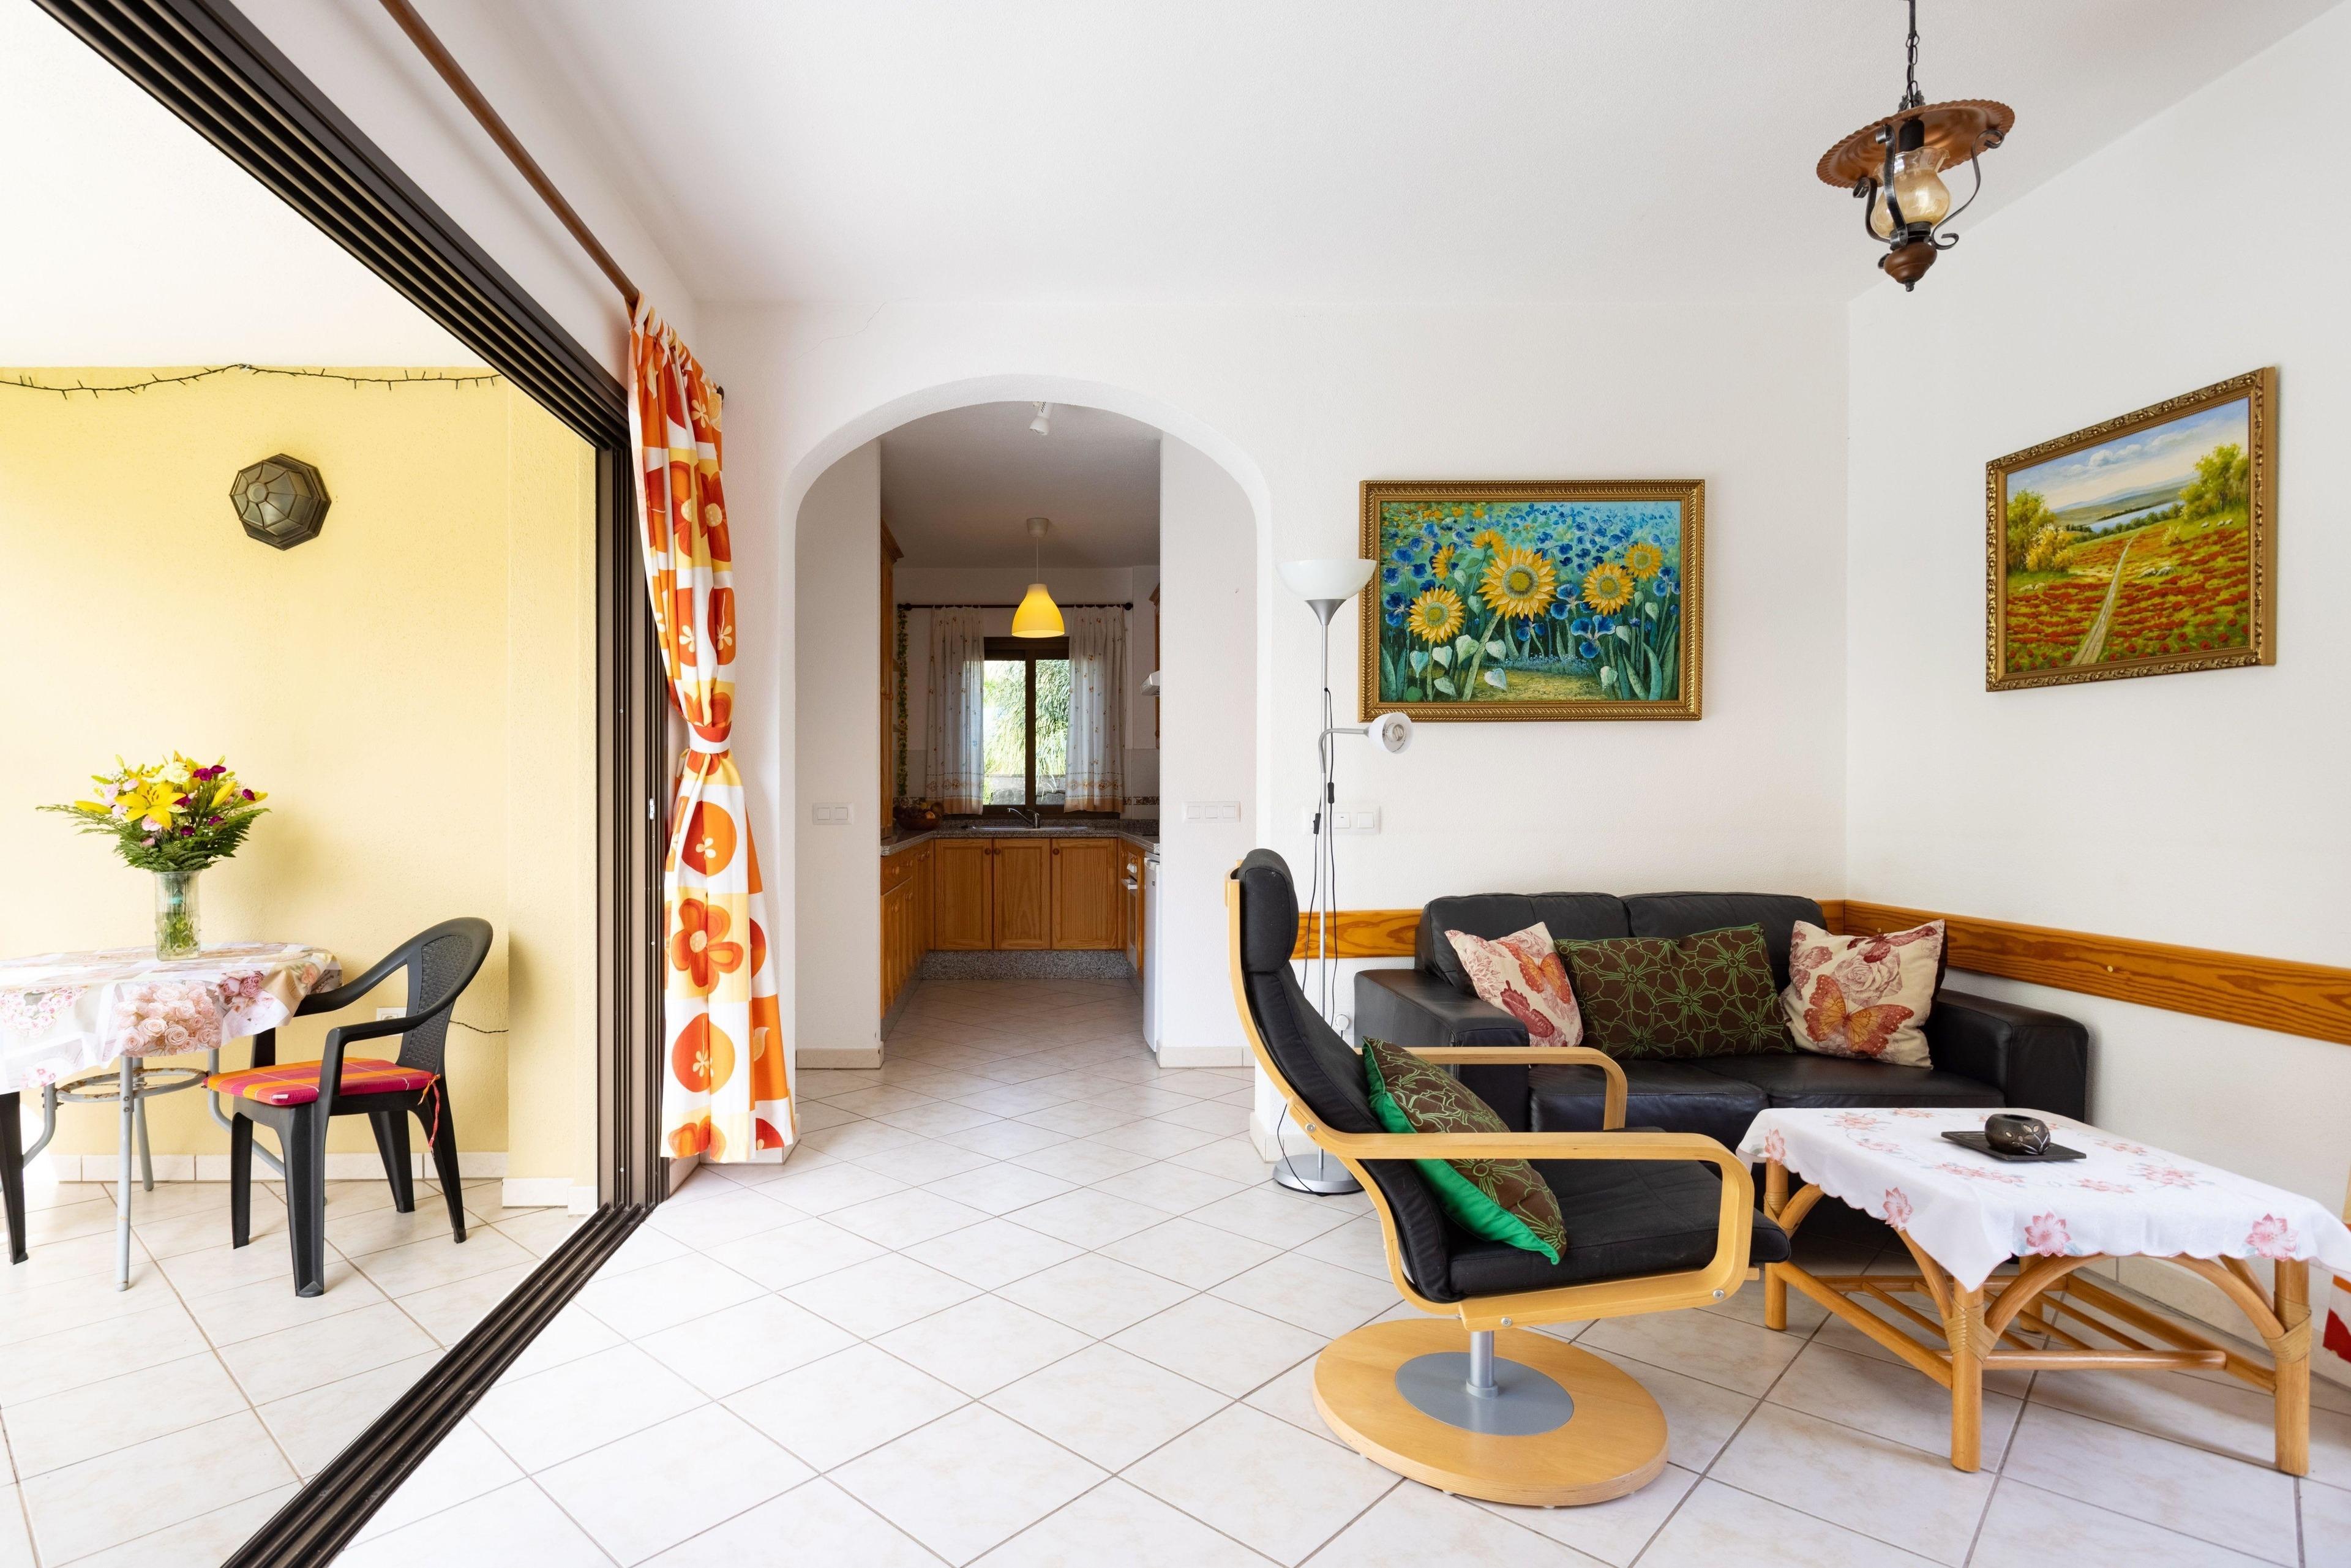 Appartement de vacances Fewo Atico Florasol, sehr ruhig direkt am Naturschutzgebiet, mit Pool, 2 Terrassen, Grill, (2492983), Santa Ursula, Ténérife, Iles Canaries, Espagne, image 3